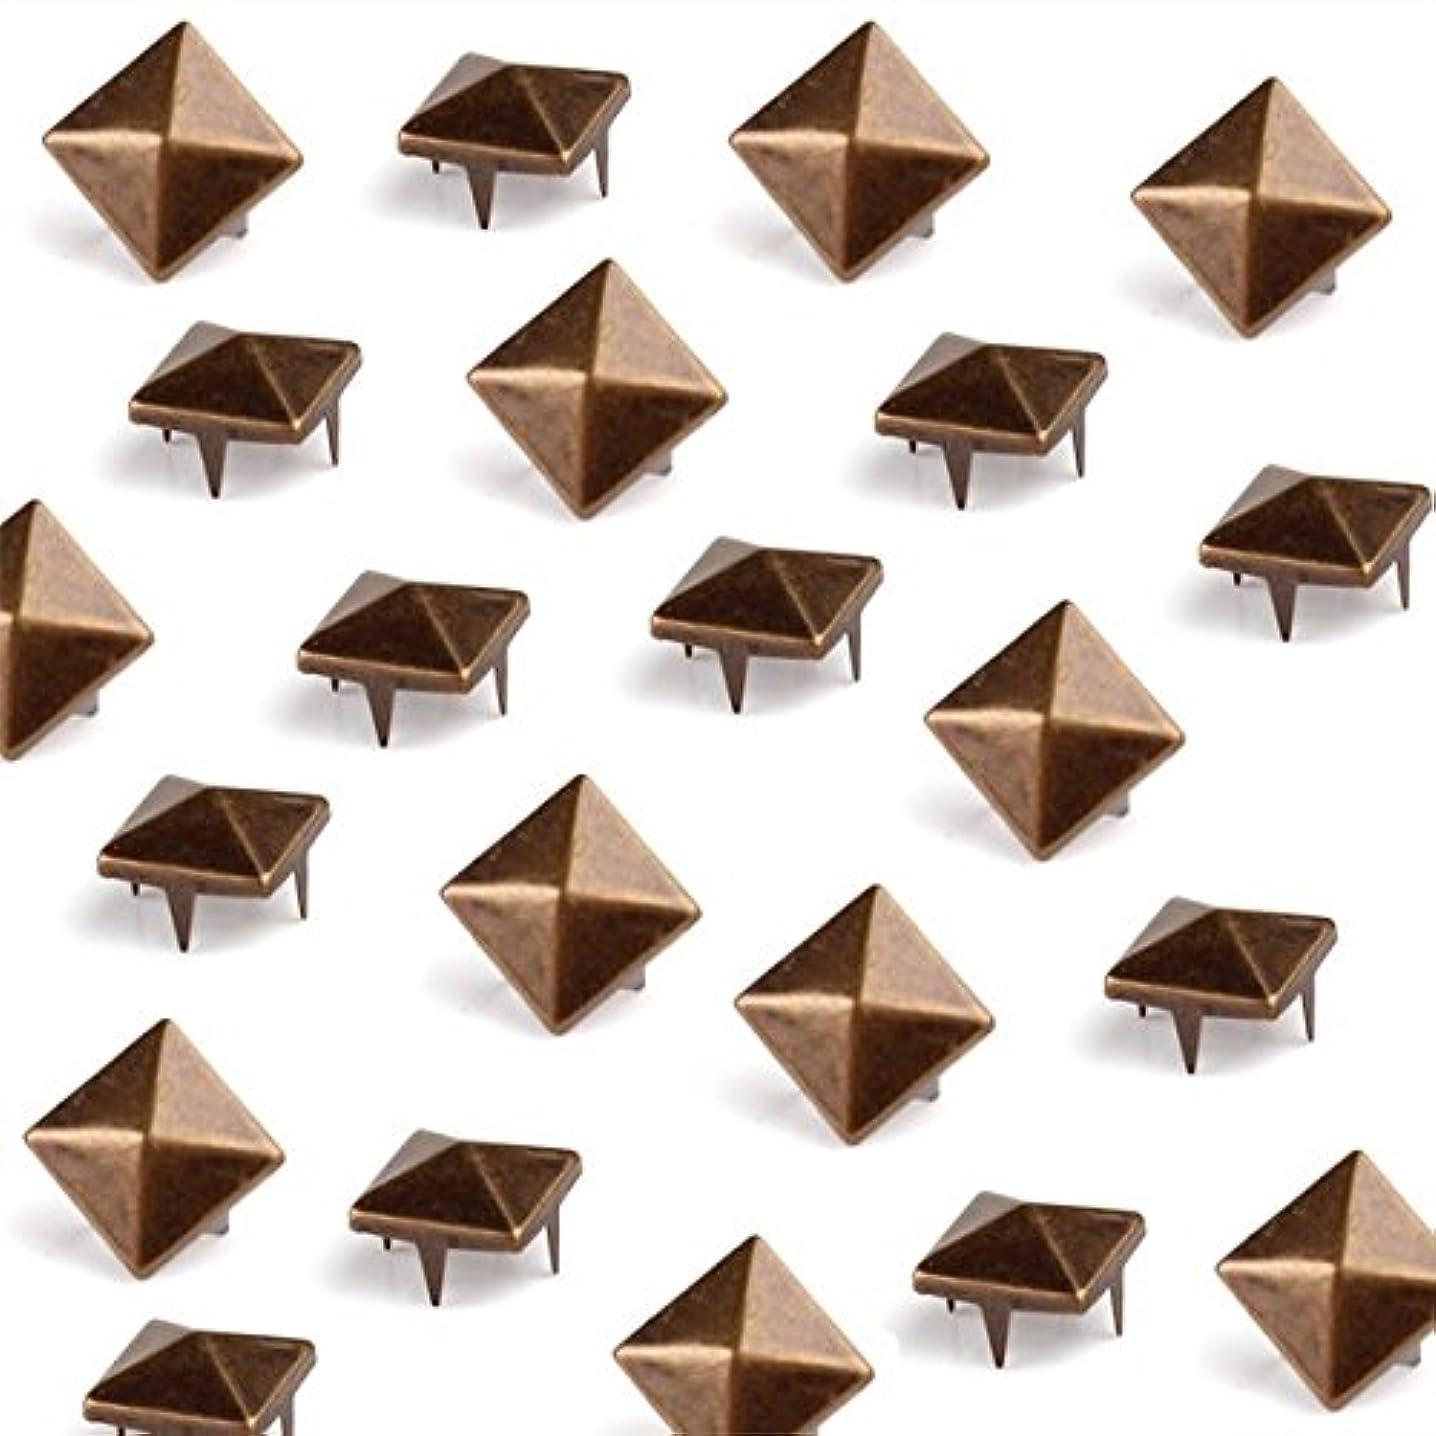 Vikeva 100x 7mm Bronze Pyramid Spots Studs Rivets Spikes DIY Belt Leathercraft